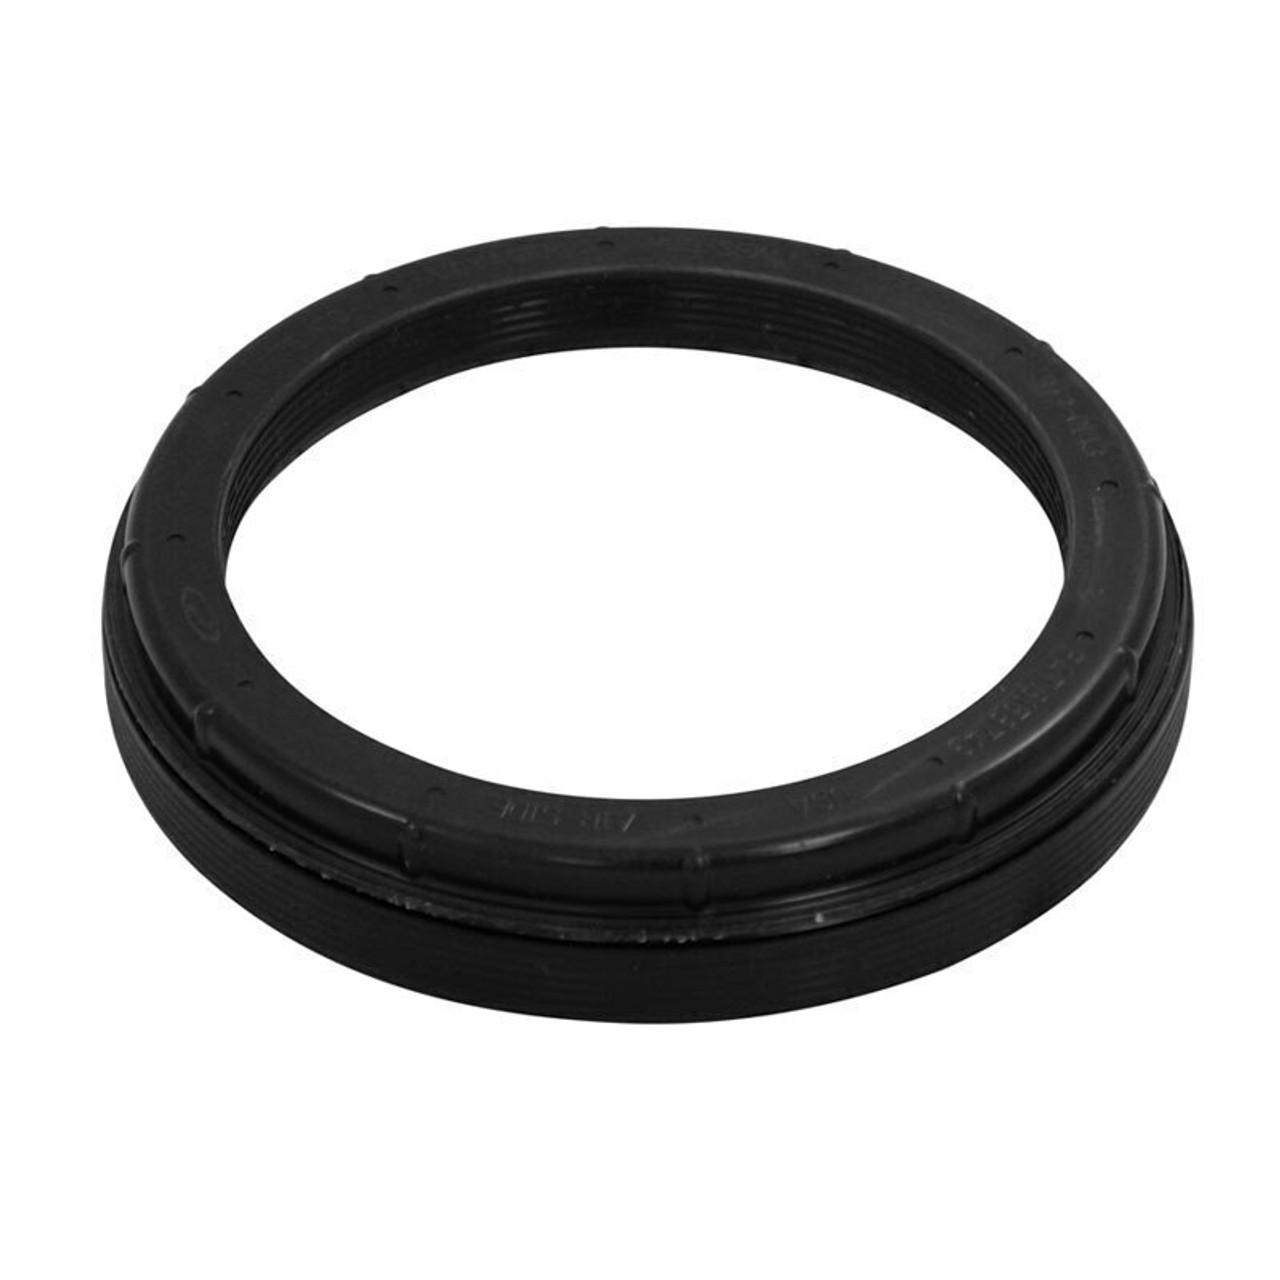 STEMCO / 373-0113 / Oil Seal (Voyager)